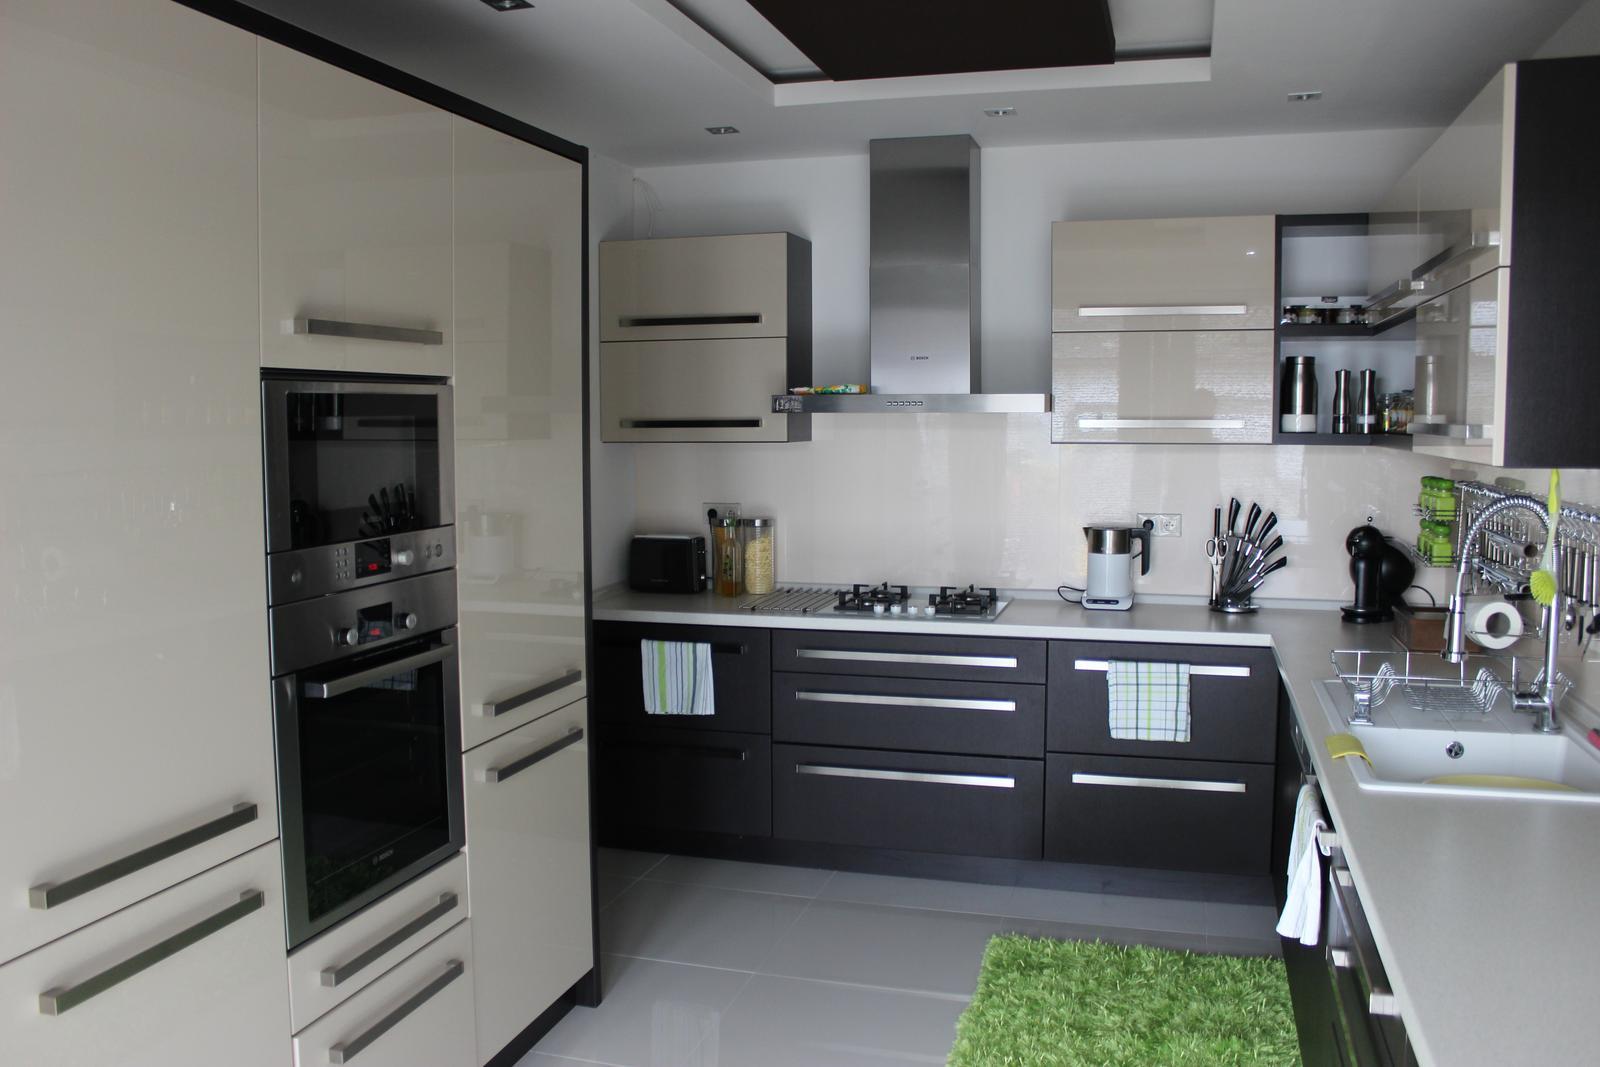 Naša kuchyňa :) - Obrázok č. 1